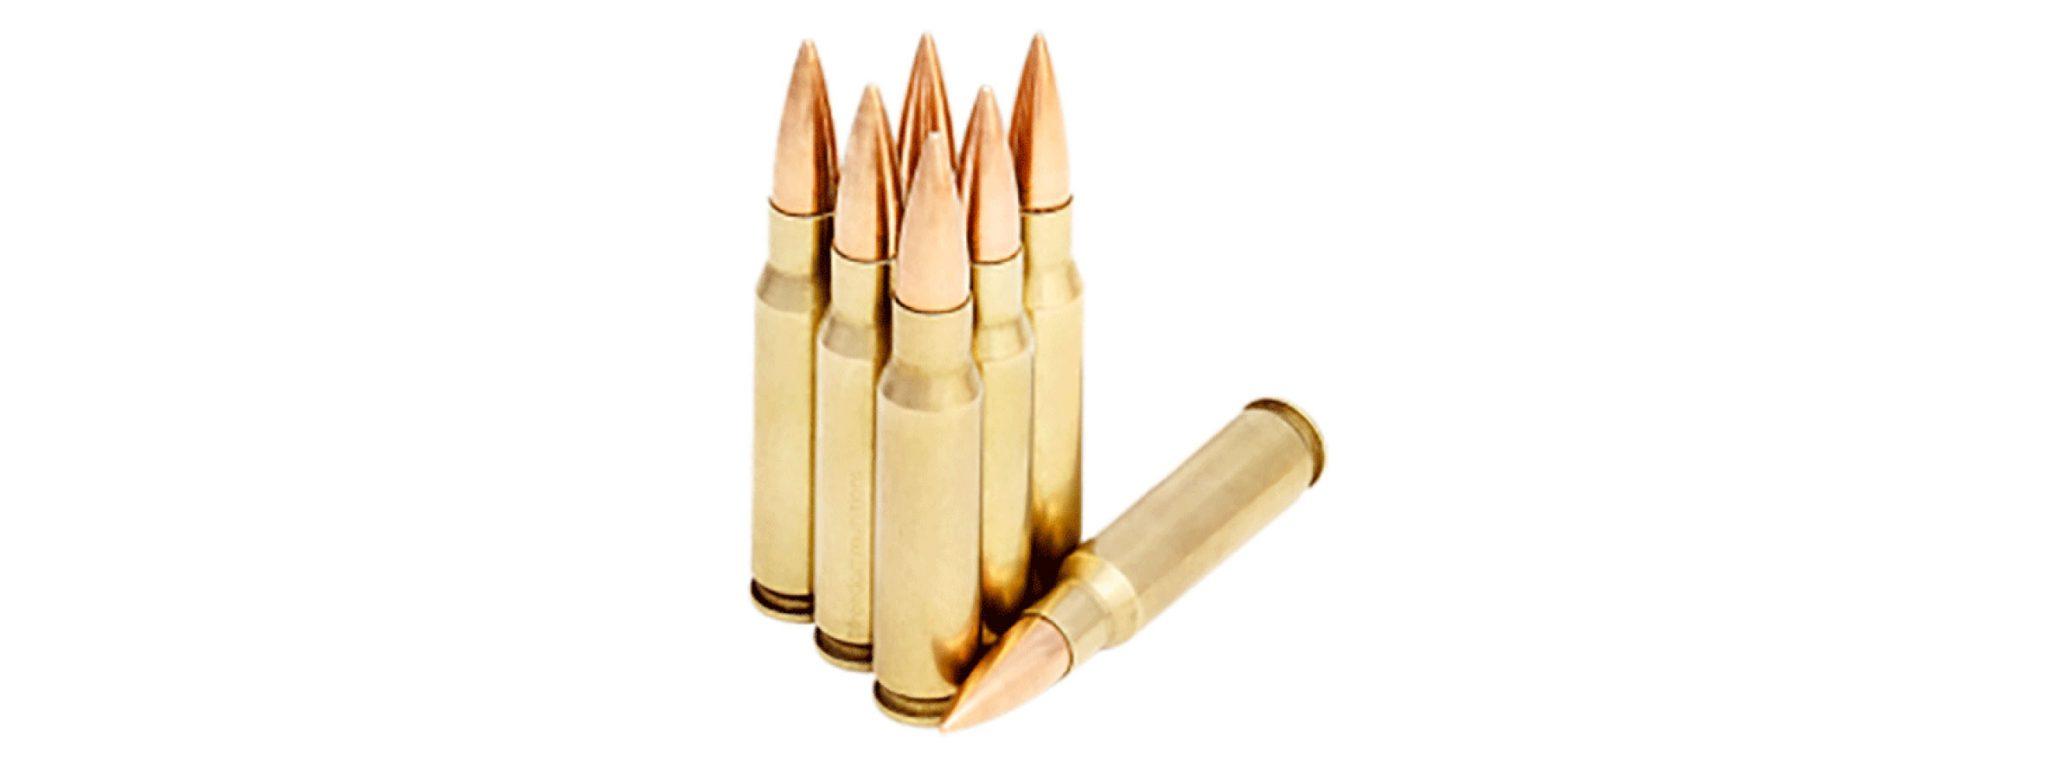 ammo1